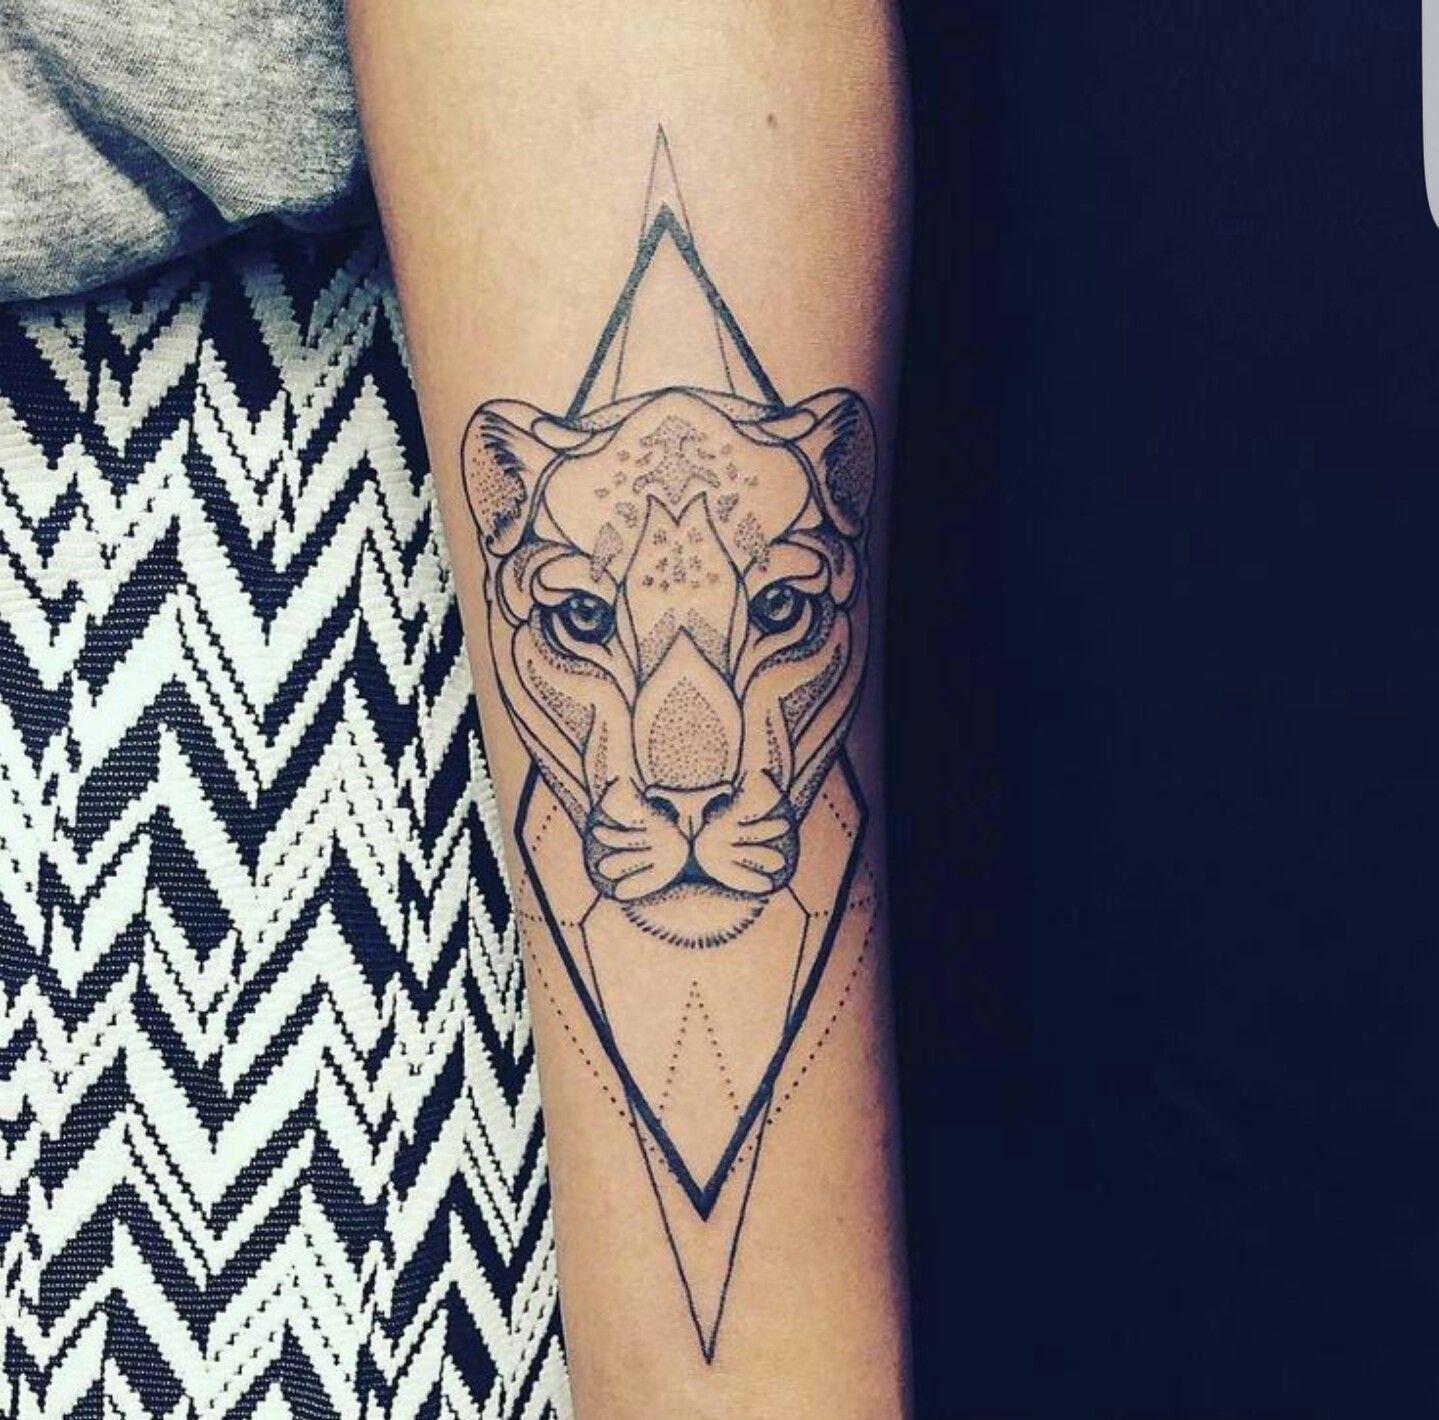 pingl par leonierandria sur tatouages tatouage tatouage lion et tatouage bras. Black Bedroom Furniture Sets. Home Design Ideas